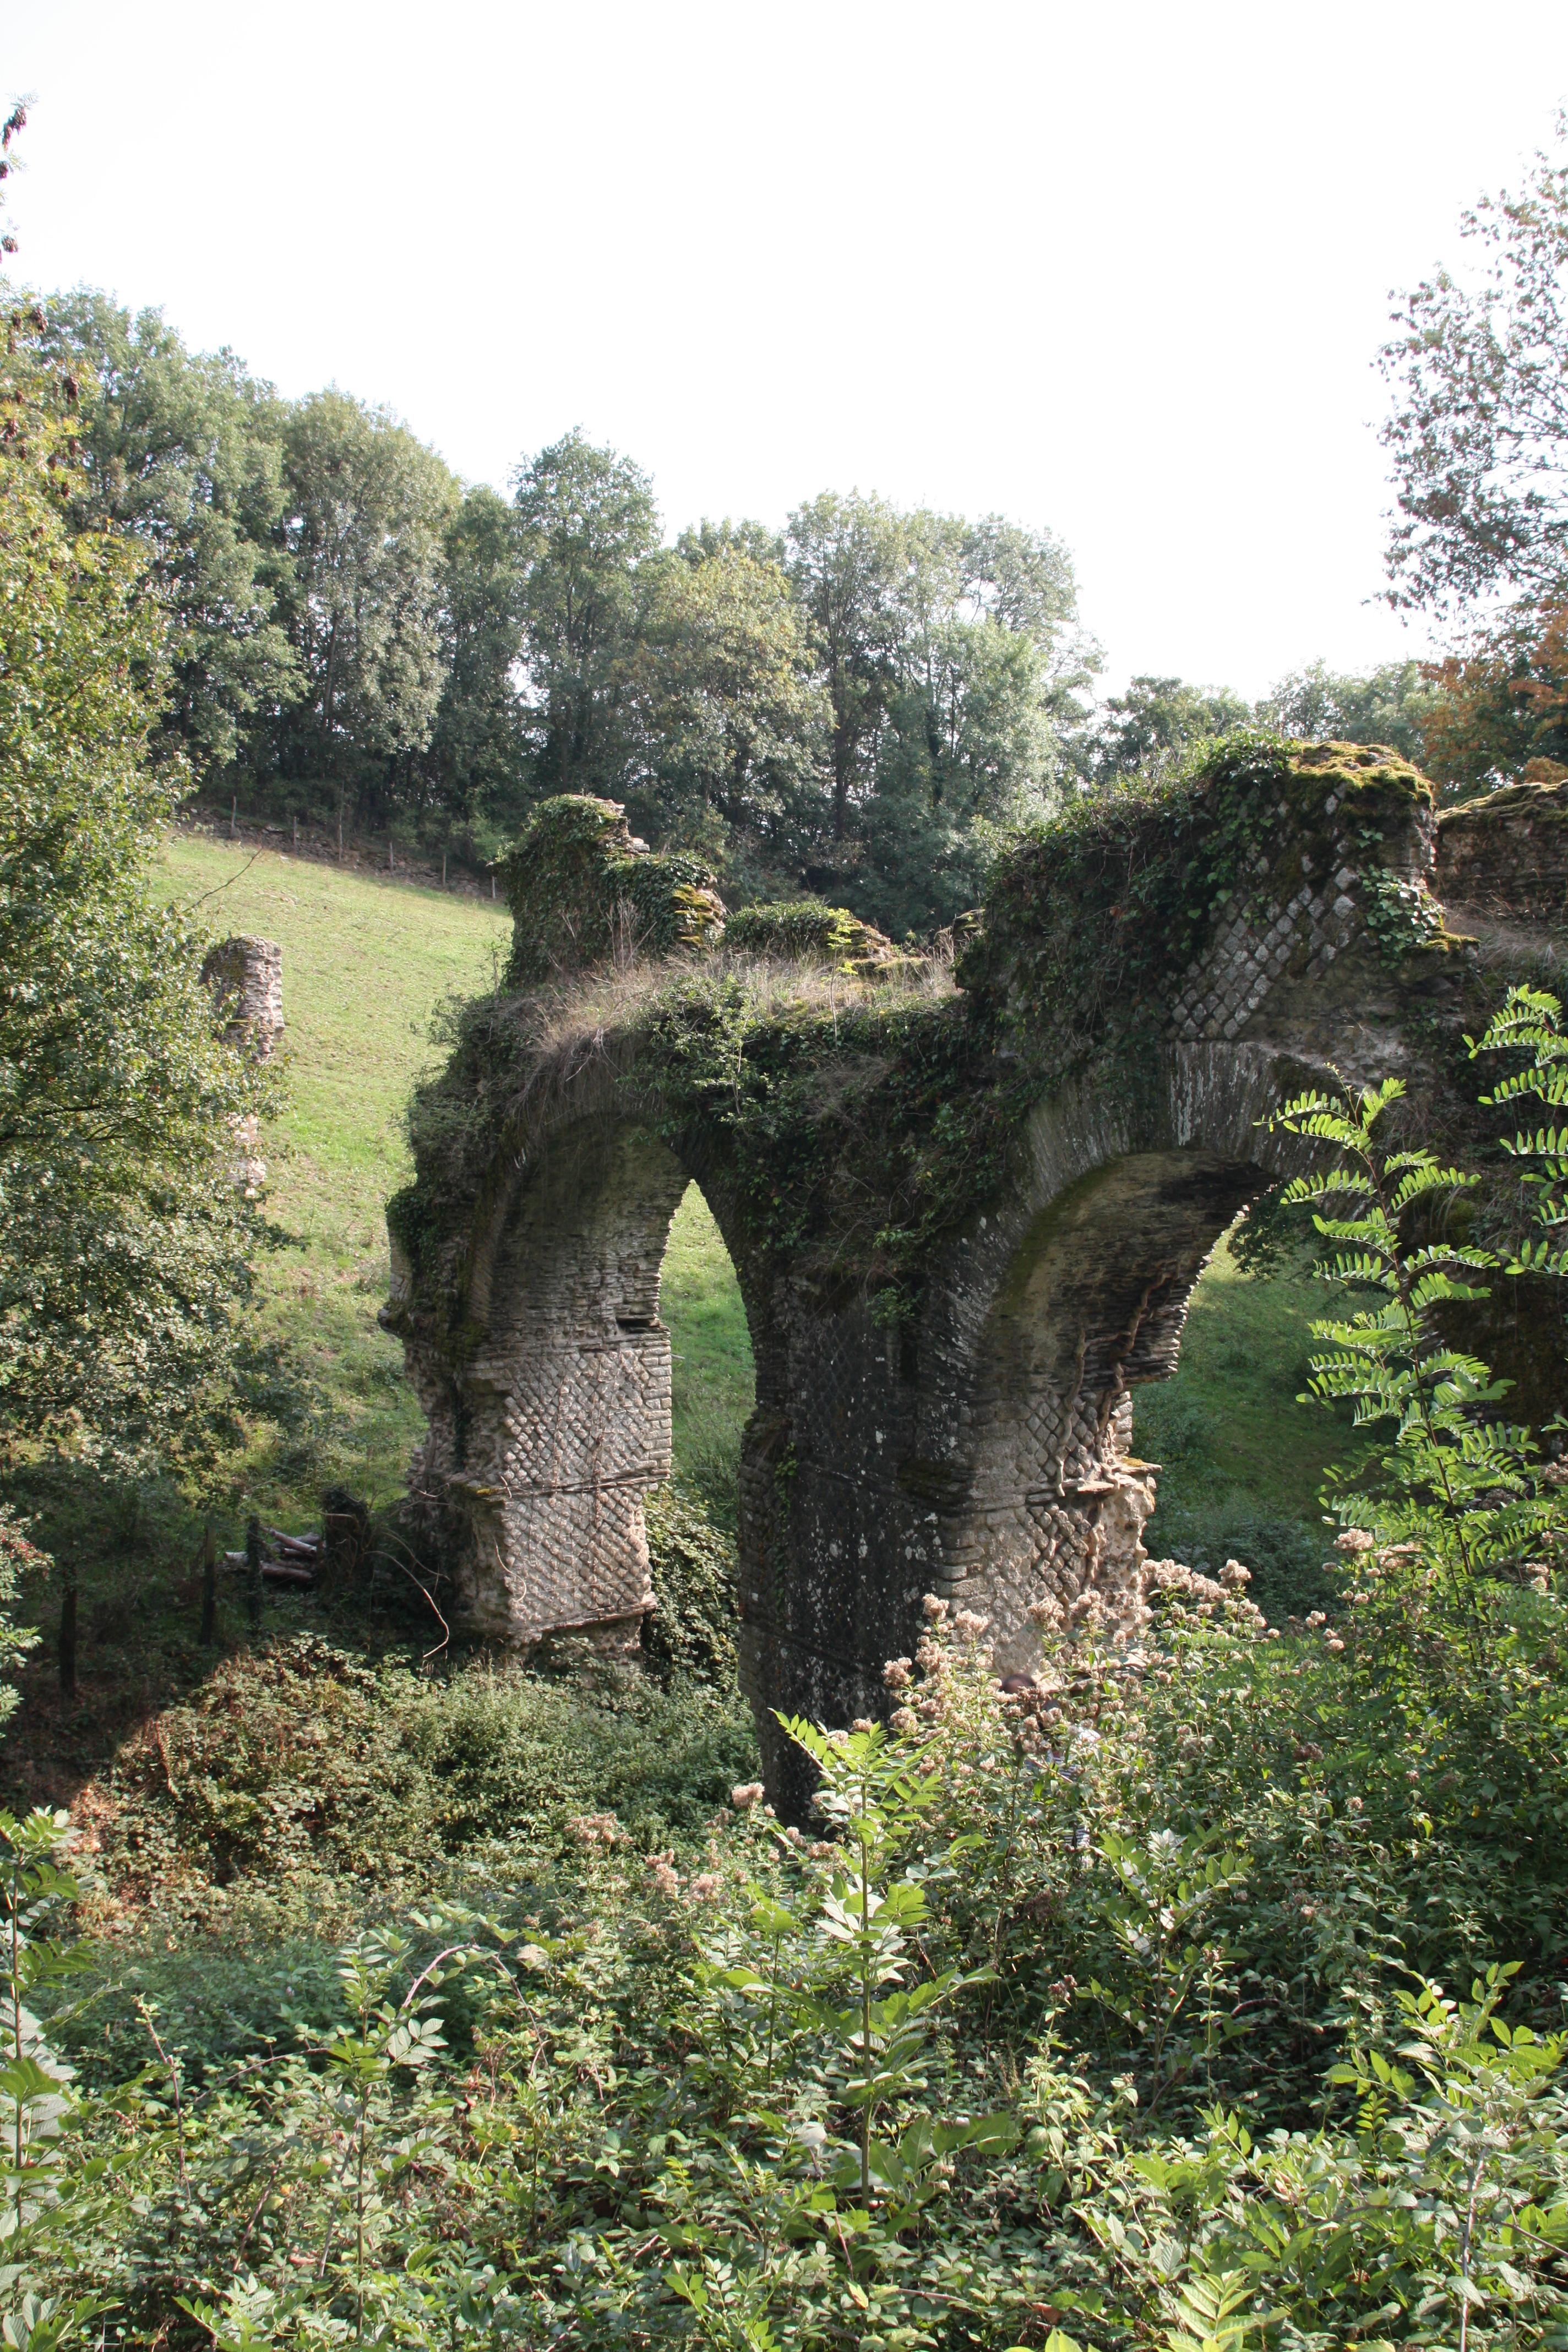 https://upload.wikimedia.org/wikipedia/commons/e/ec/Pont-Aqueduc_des_Granges._011.JPG